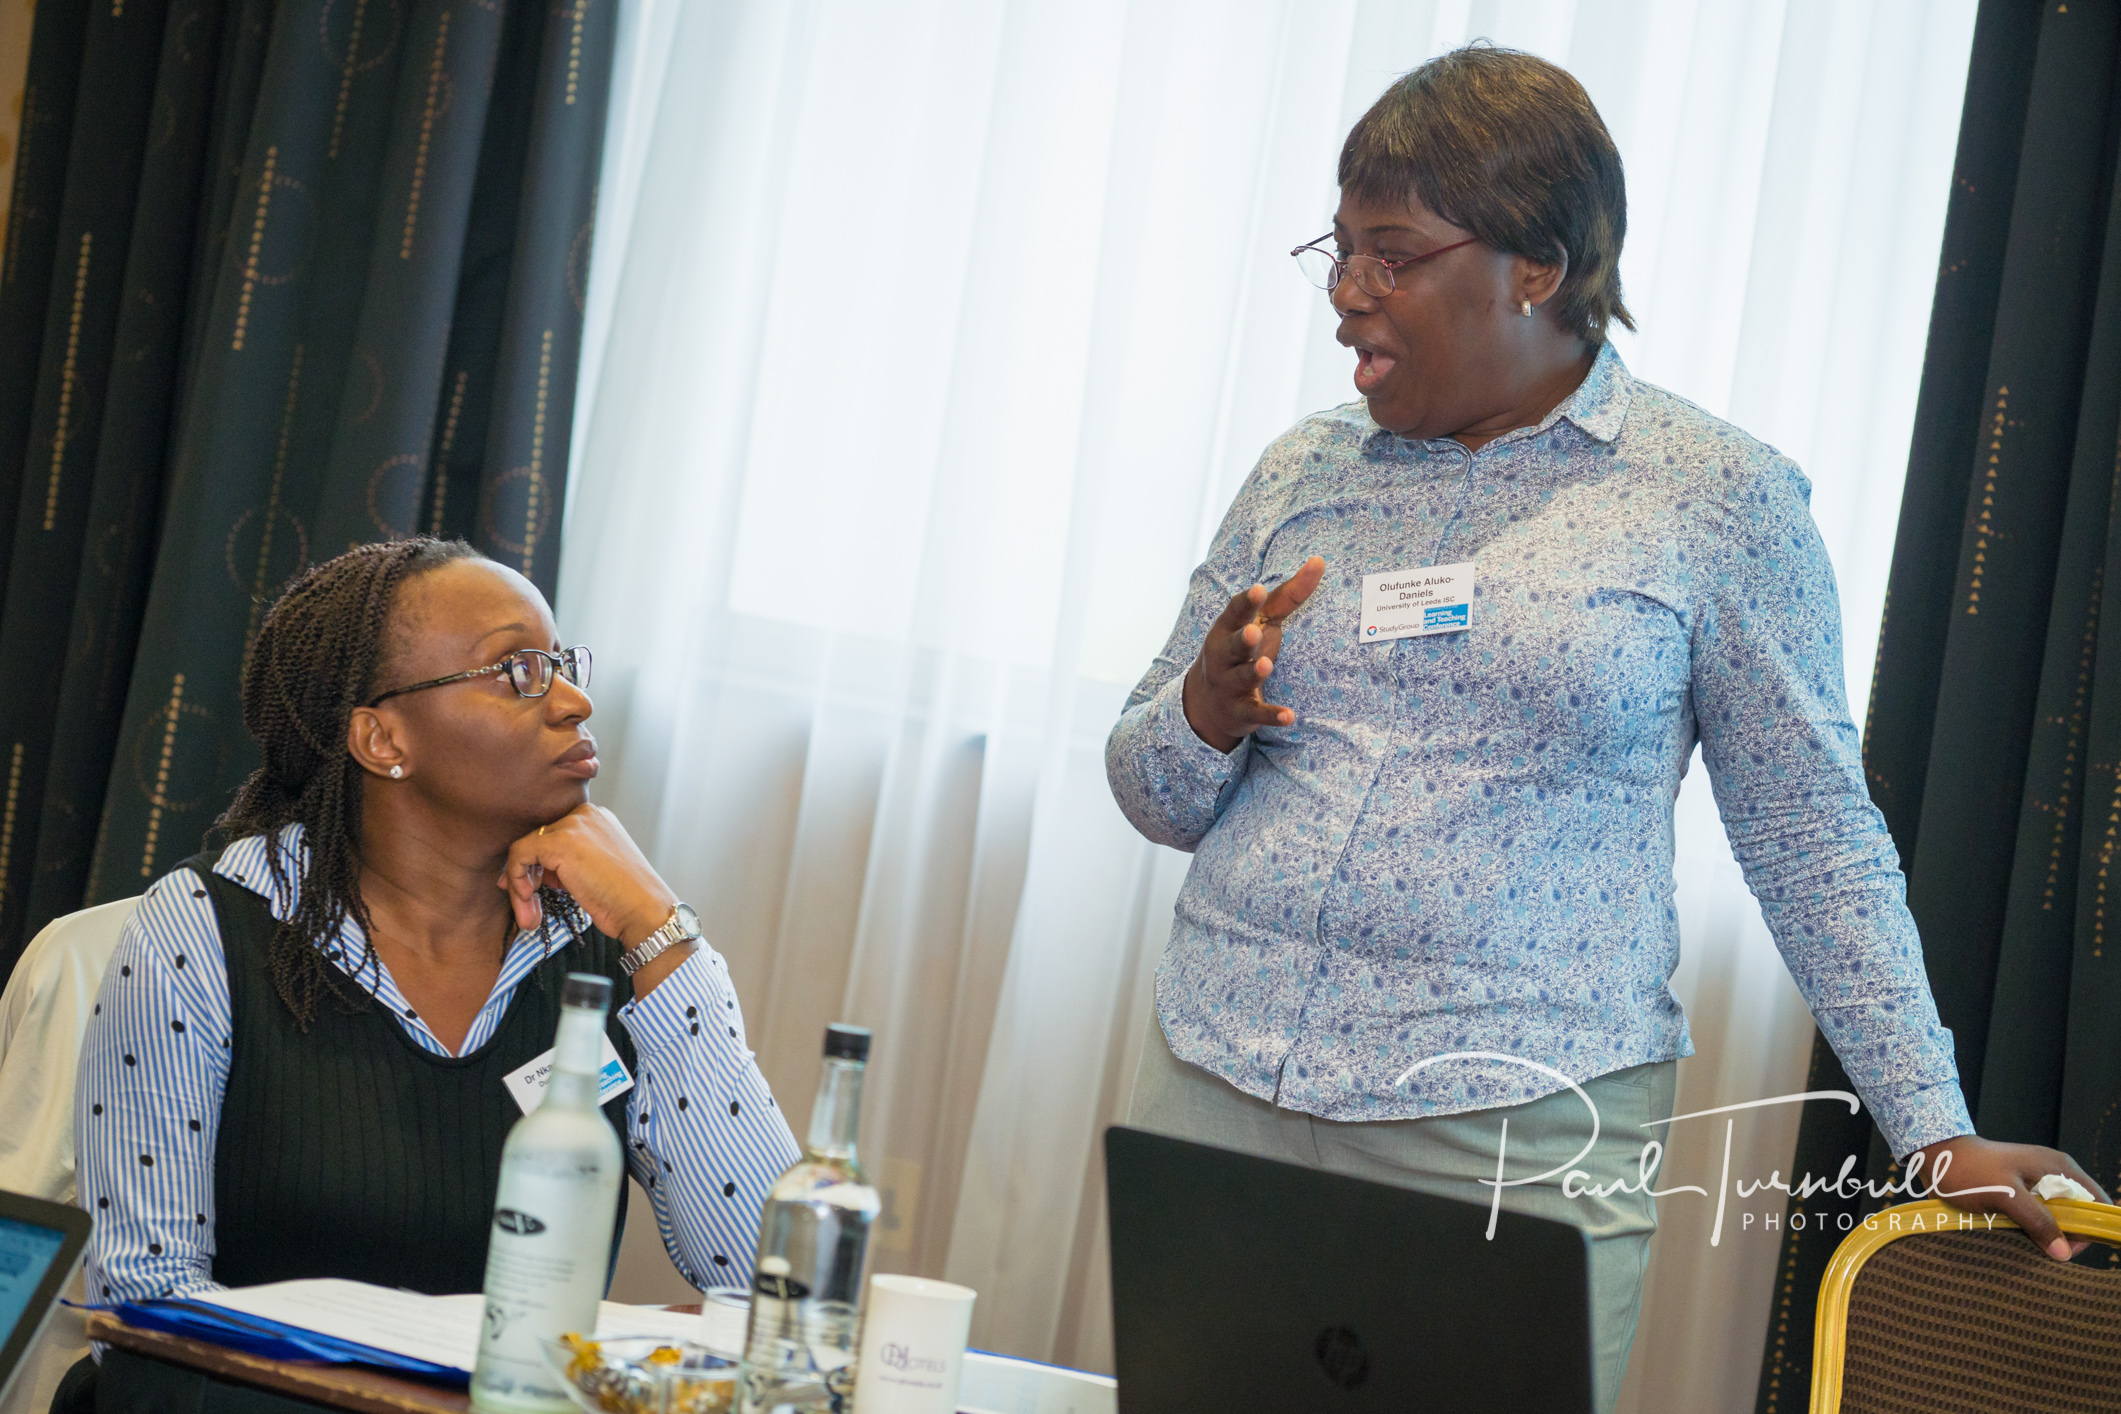 conference-event-photographer-queens-hotel-leeds-yorkshire-052.jpg